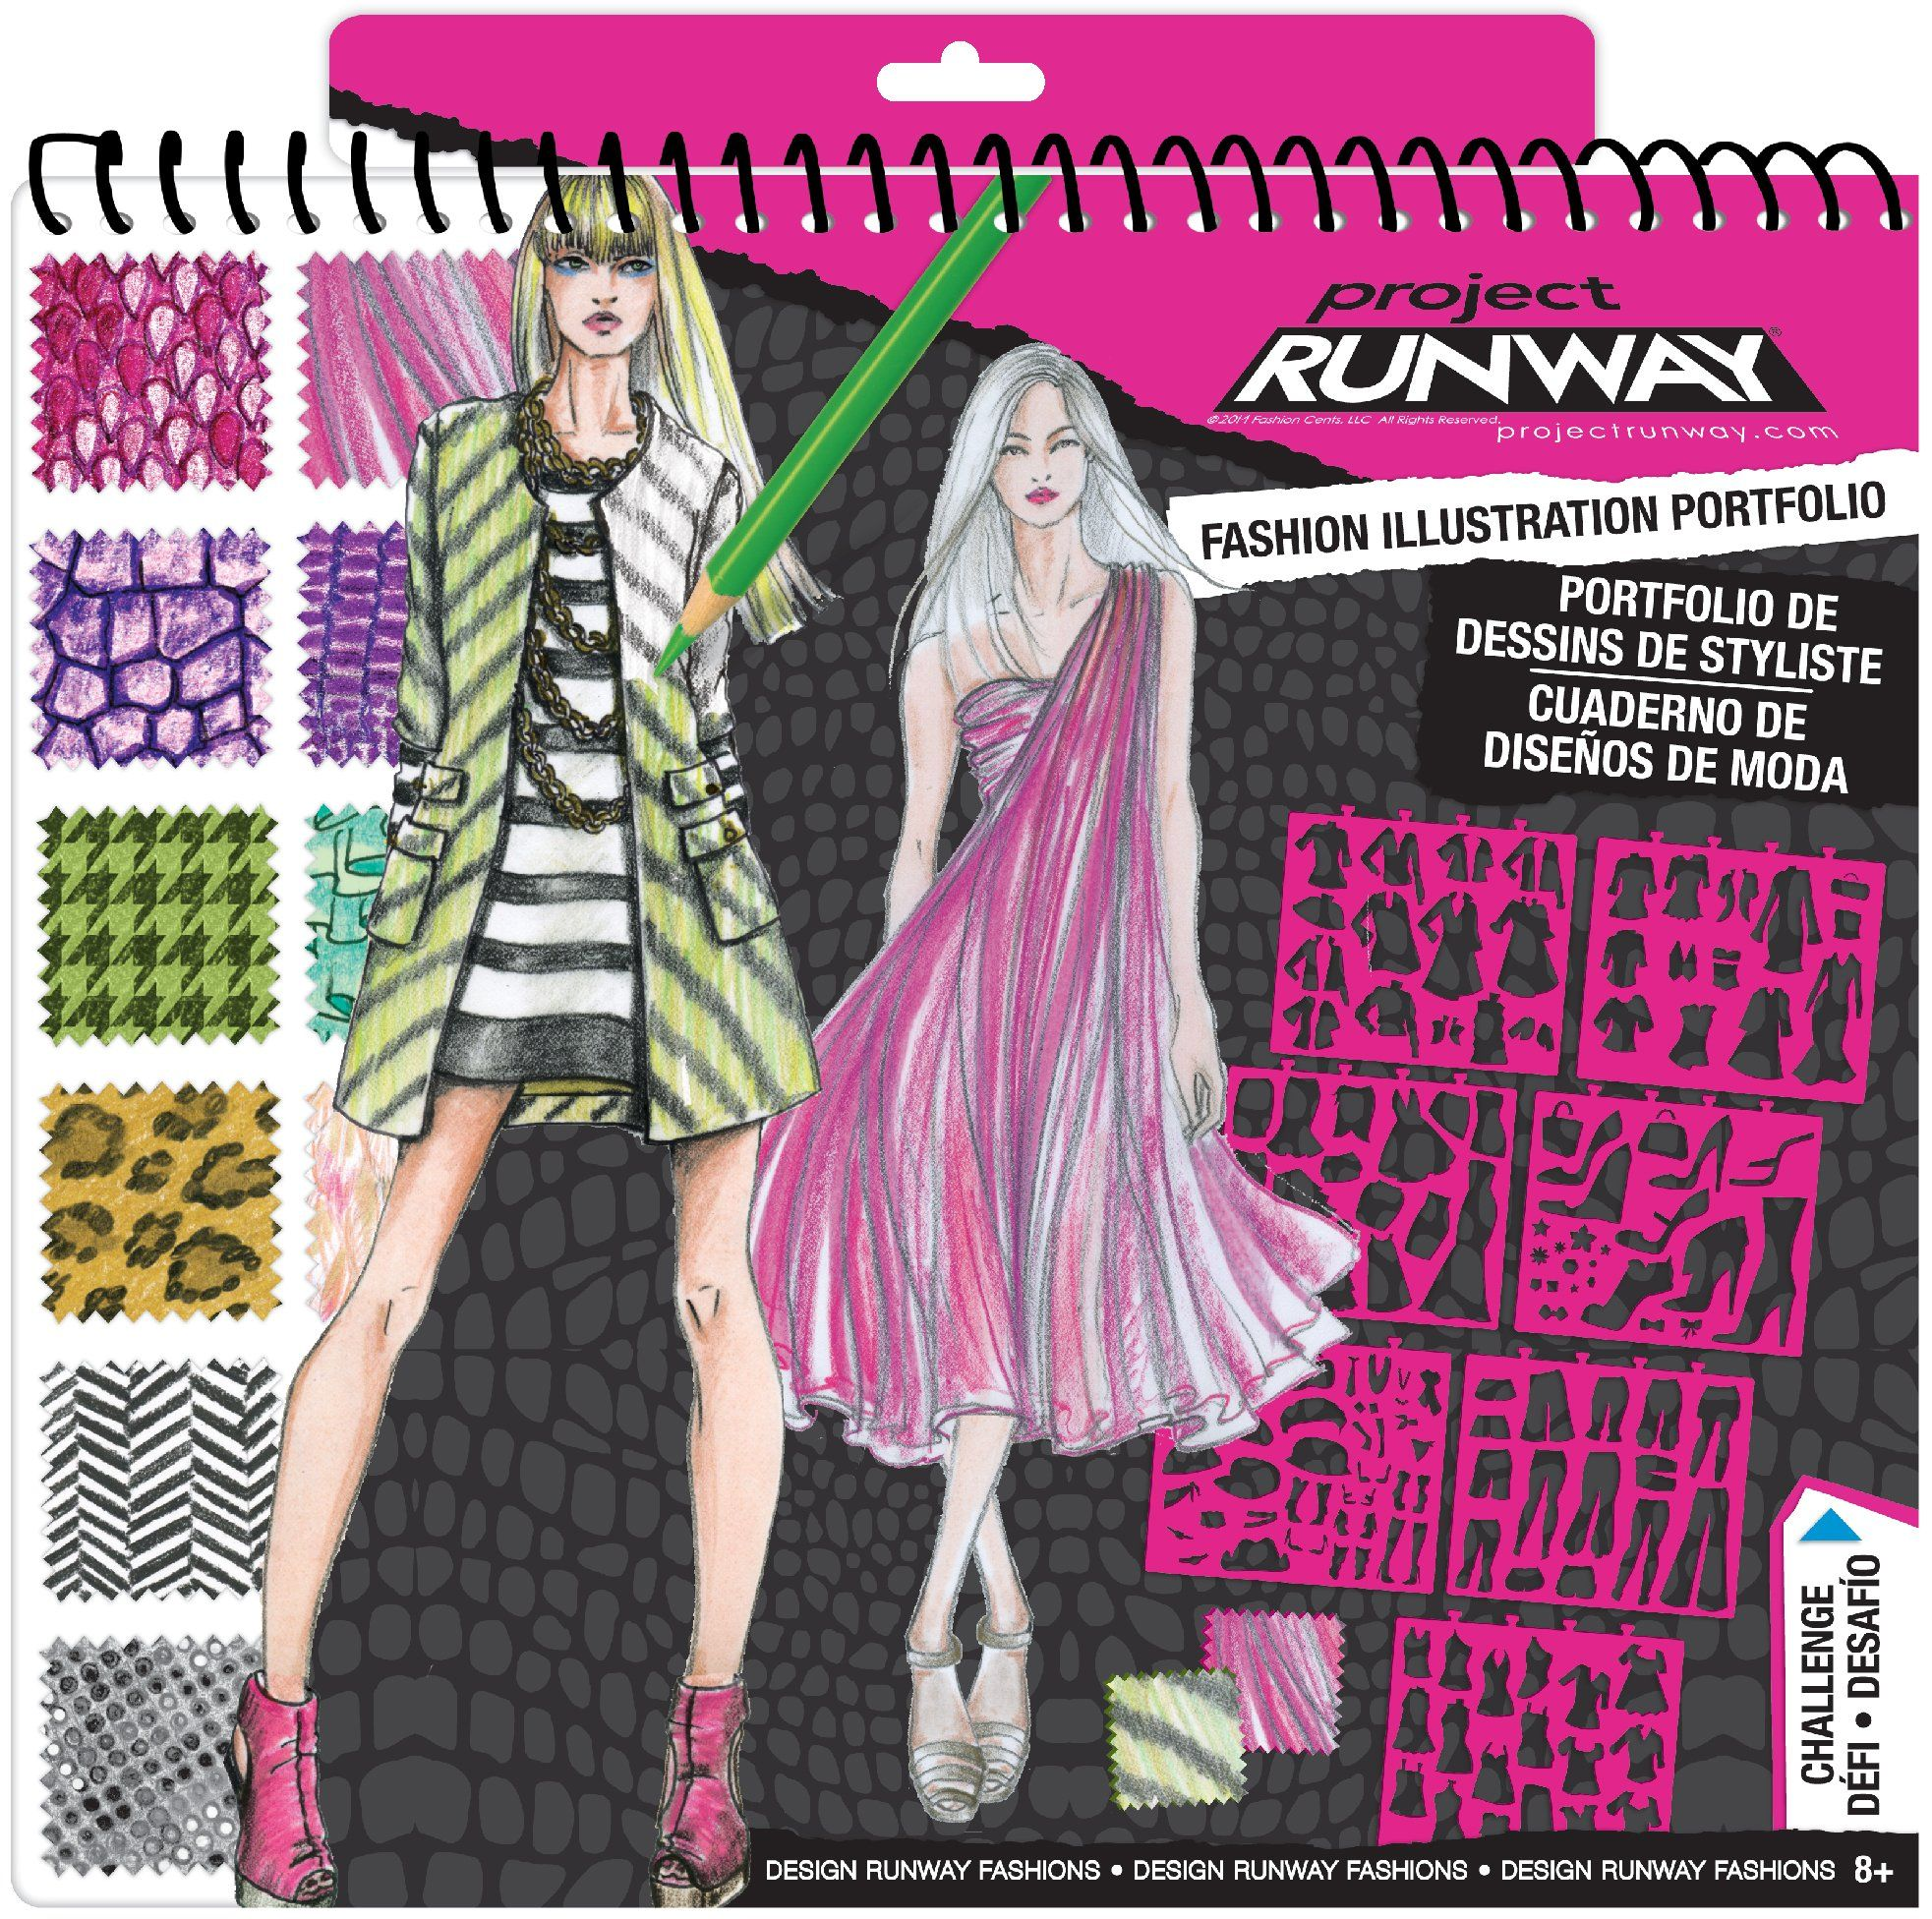 Project Runway Fashion Design Sketch Portfolio Fashion Illustration Portfolio Fashion Design Sketch Fashion Design